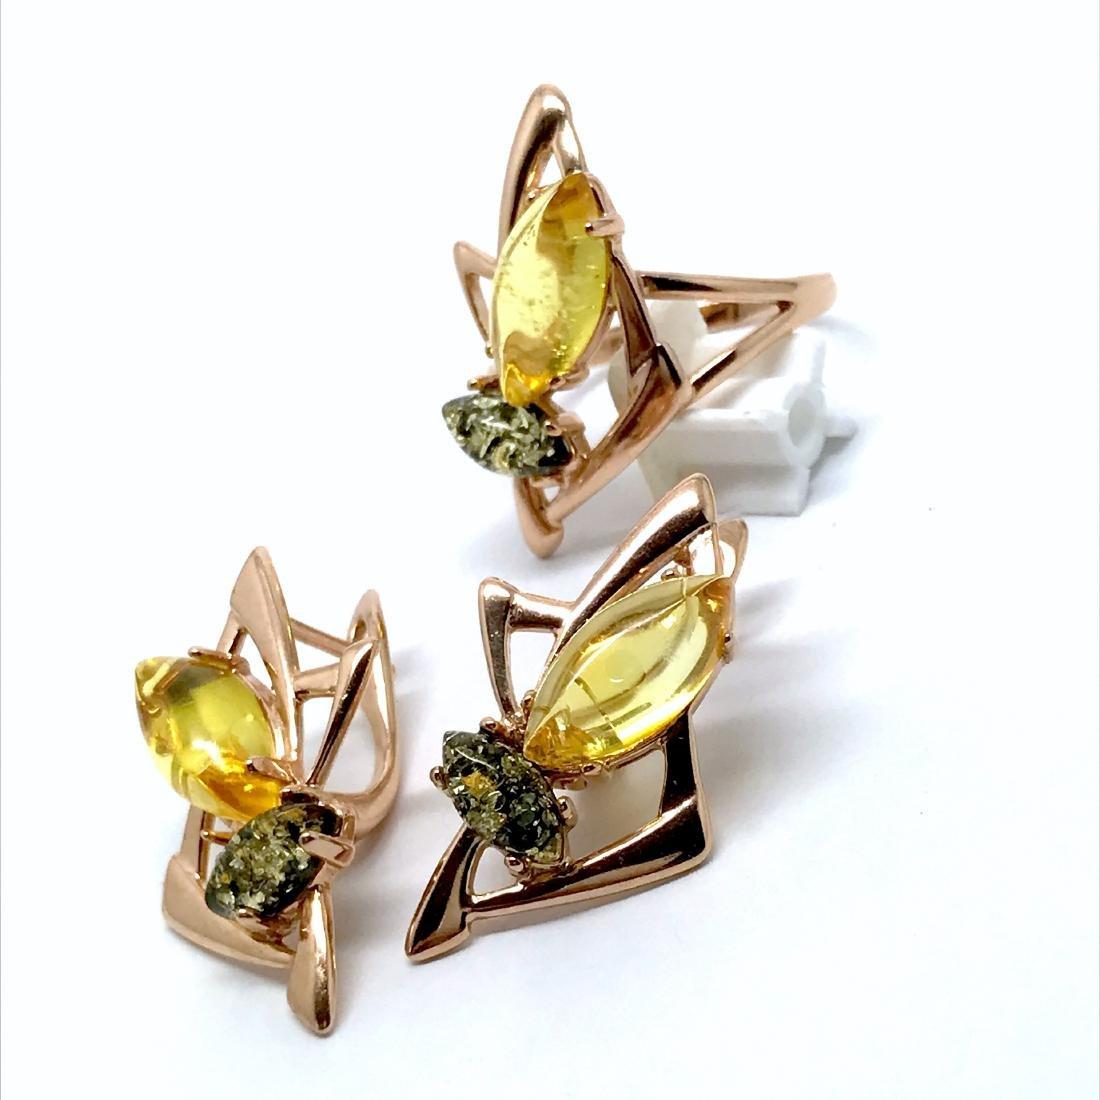 Baltic amber set Ring + Earrings Ag925 goldplated - 3